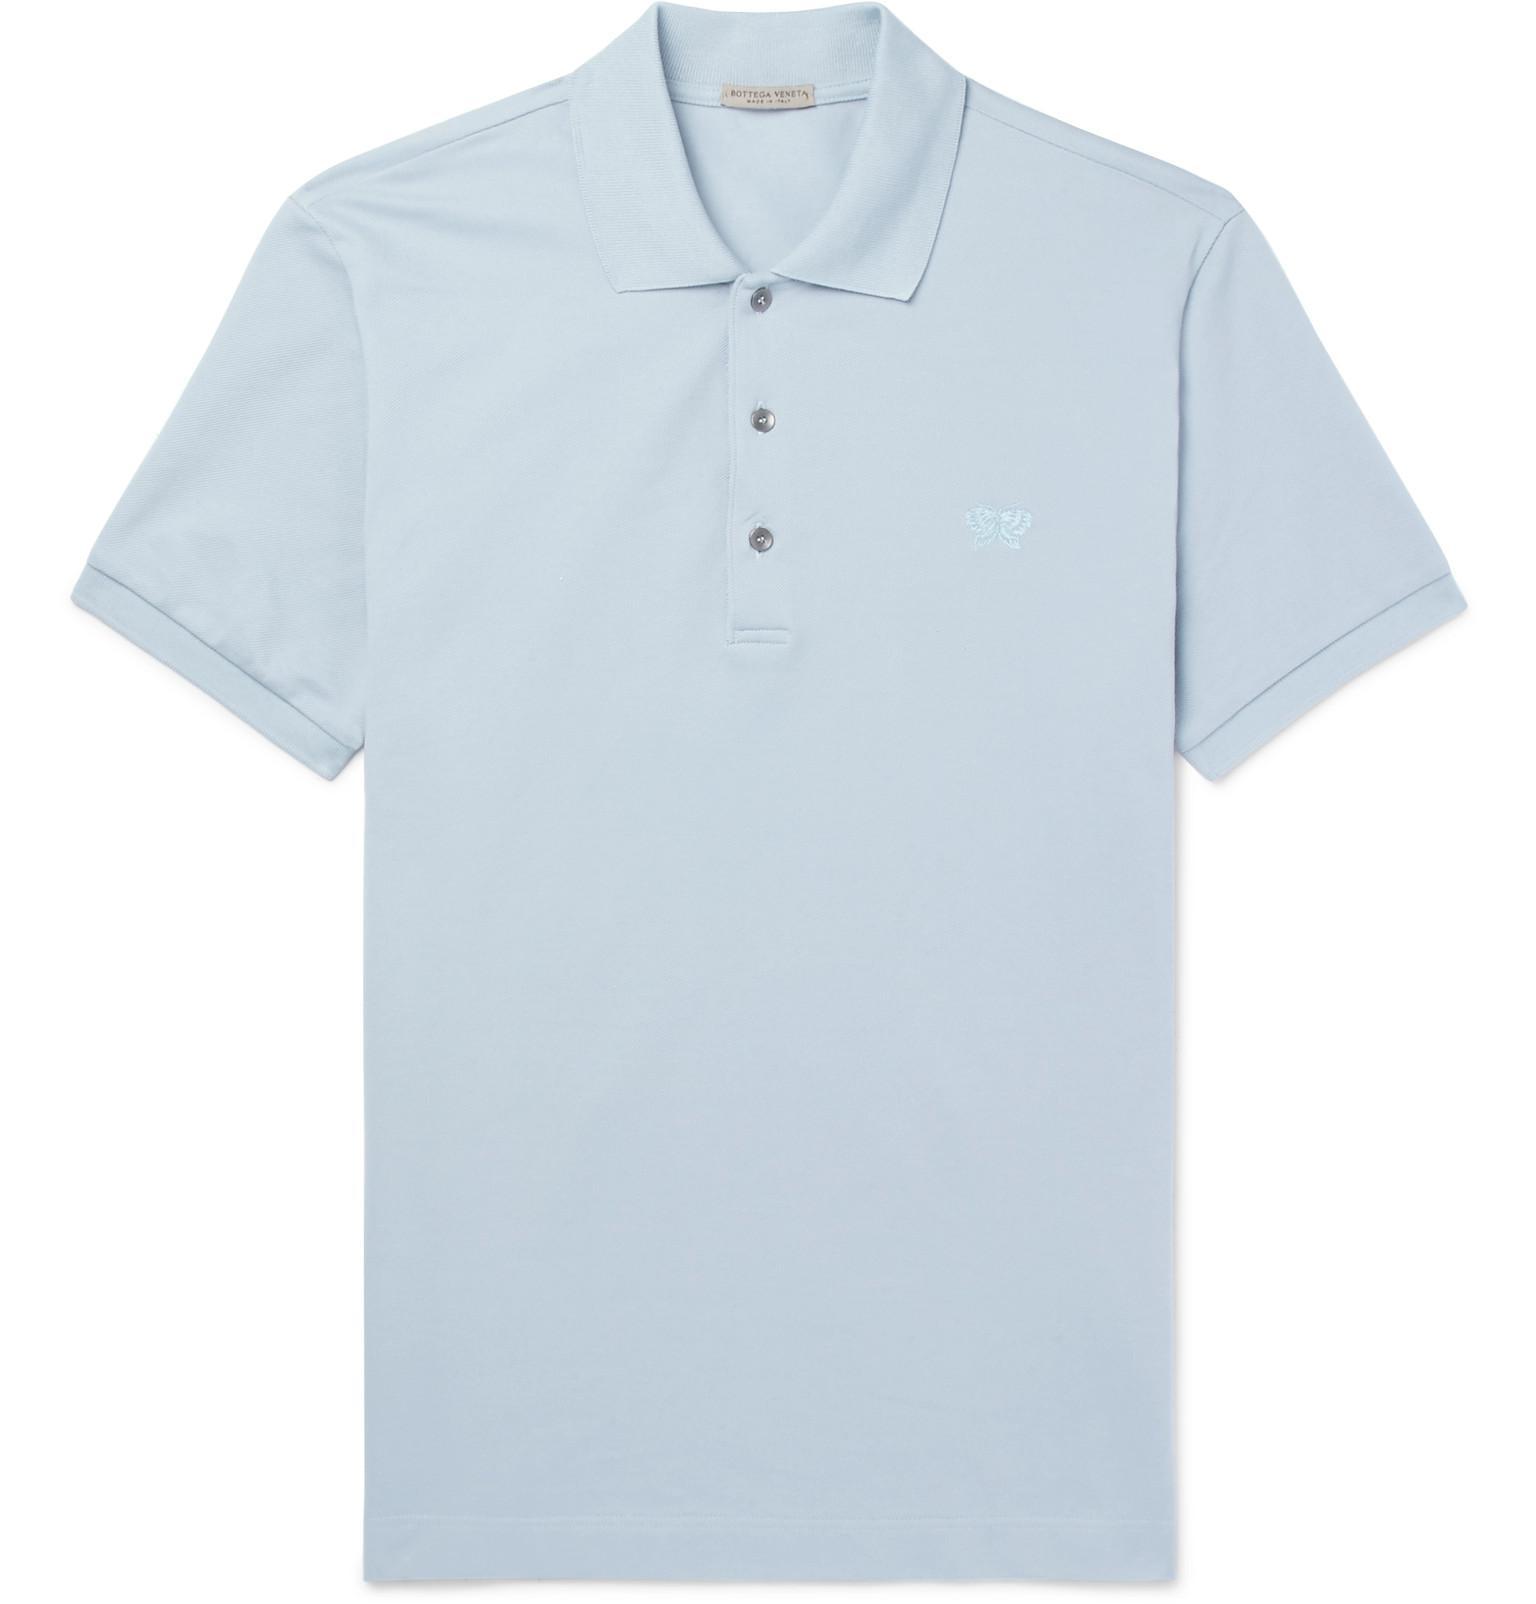 c3f70cdf8e Lyst - Bottega Veneta Cotton-piqué Polo Shirt in Blue for Men